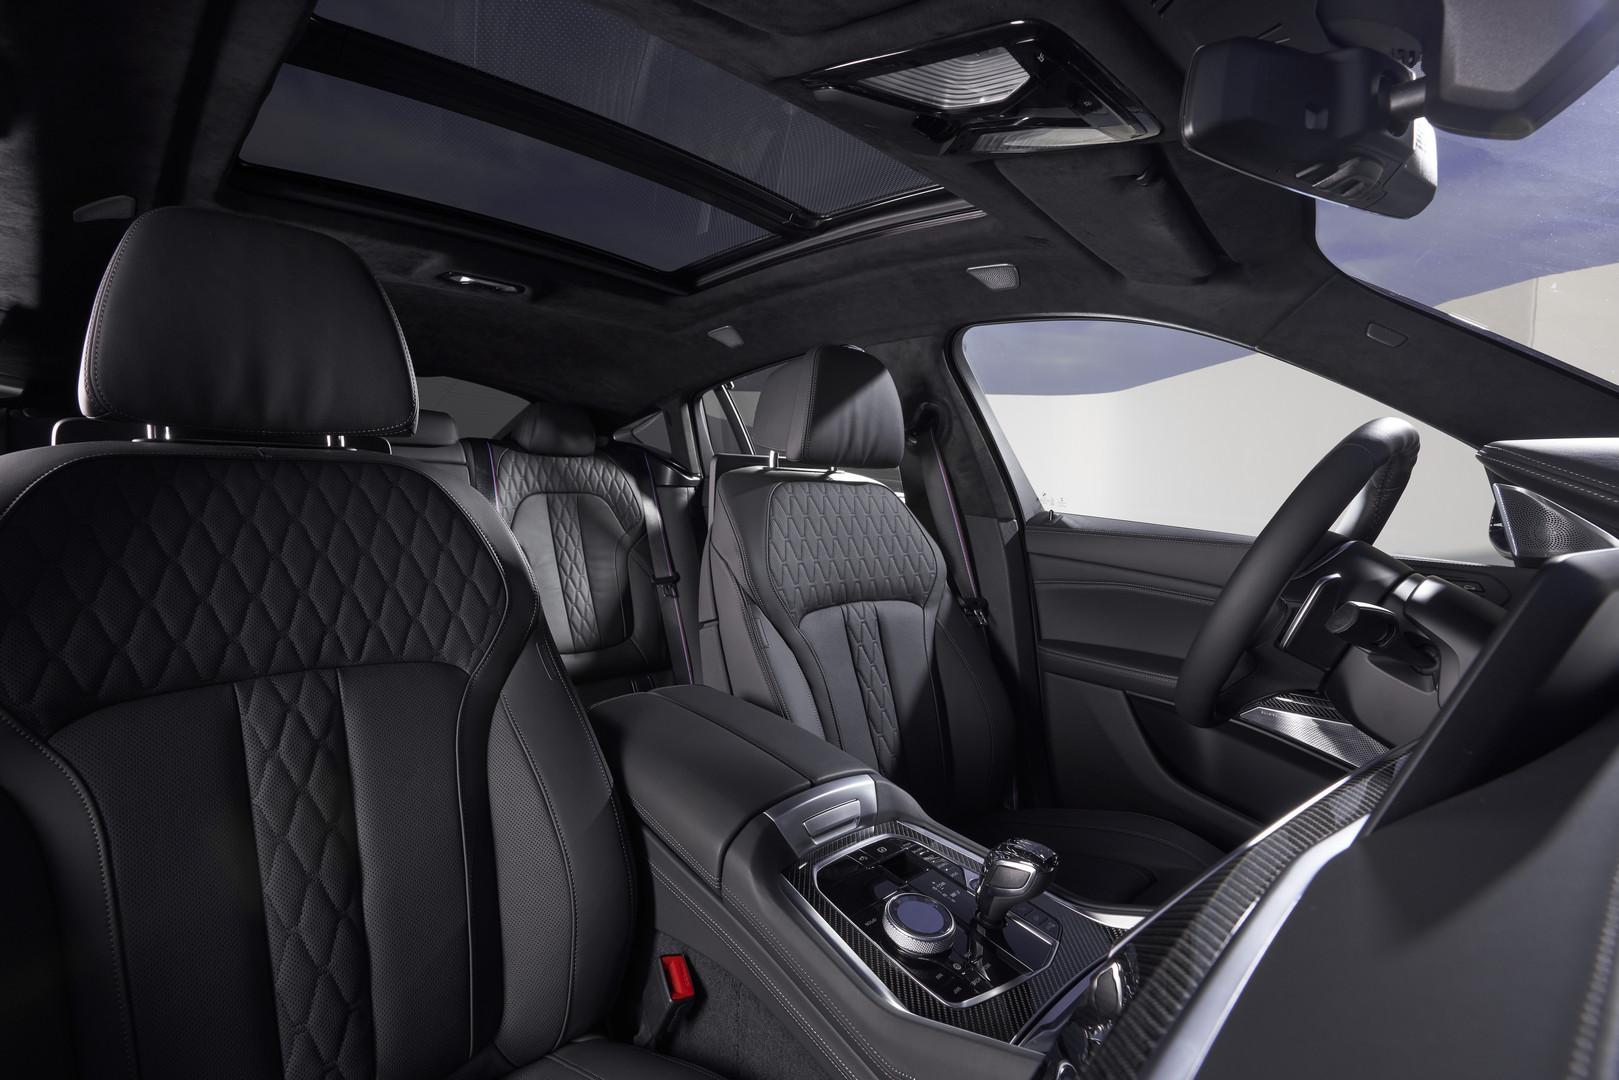 BMW X6 M50i Seats